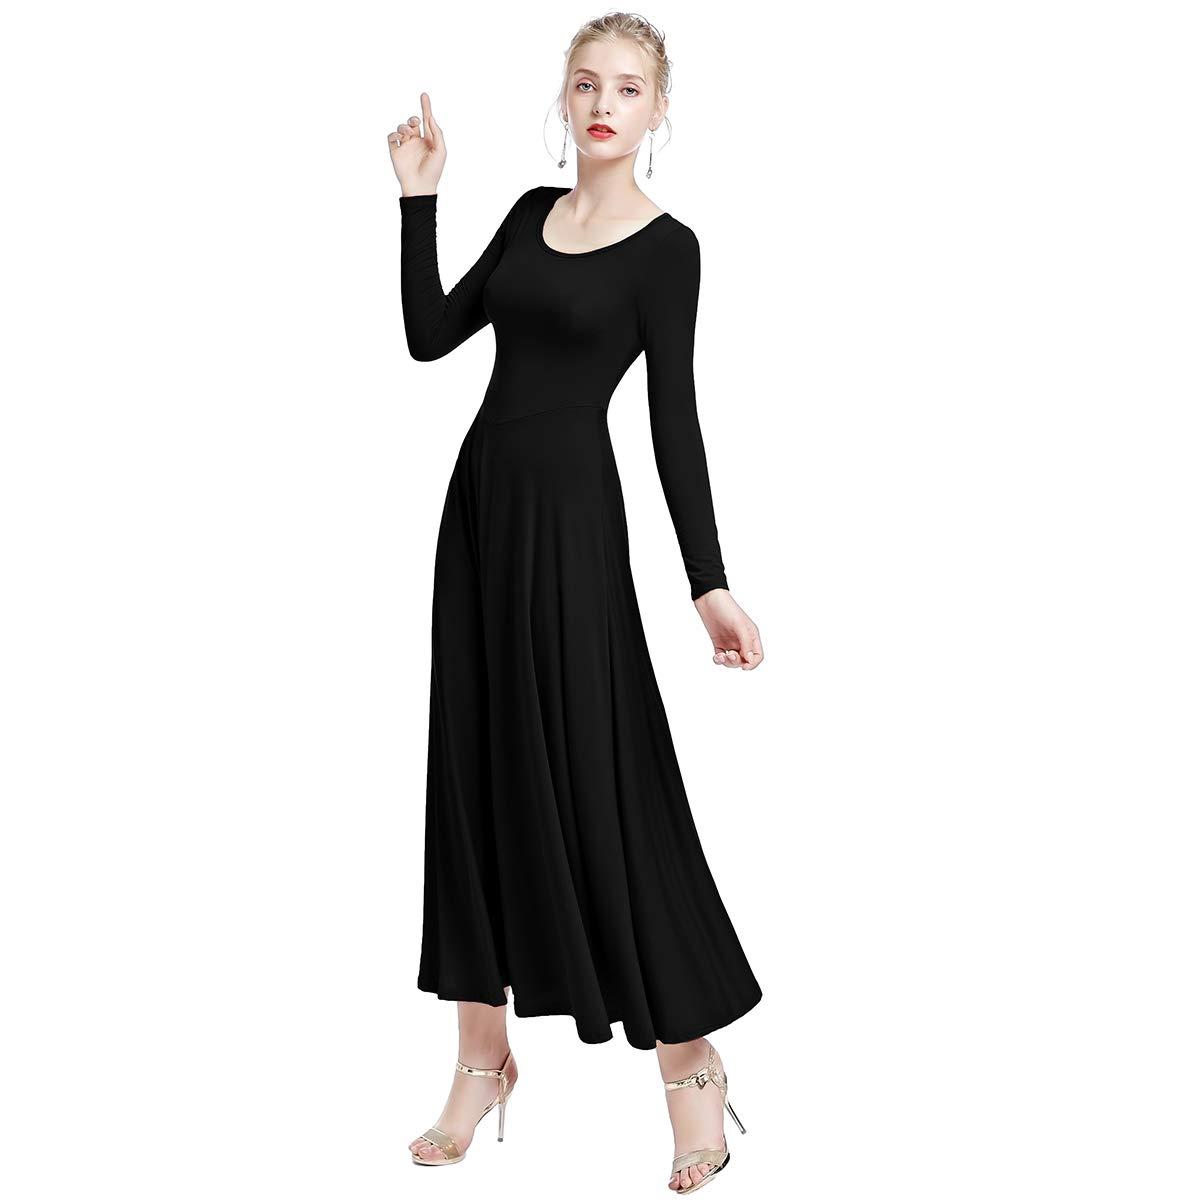 8d87363dcaf Amazon.com  IBTOM CASTLE Womens Liturgical Praise Lyrical Dance Dress Loose  Fit Full Length Long Sleeve Worship Costume Ballet  Clothing